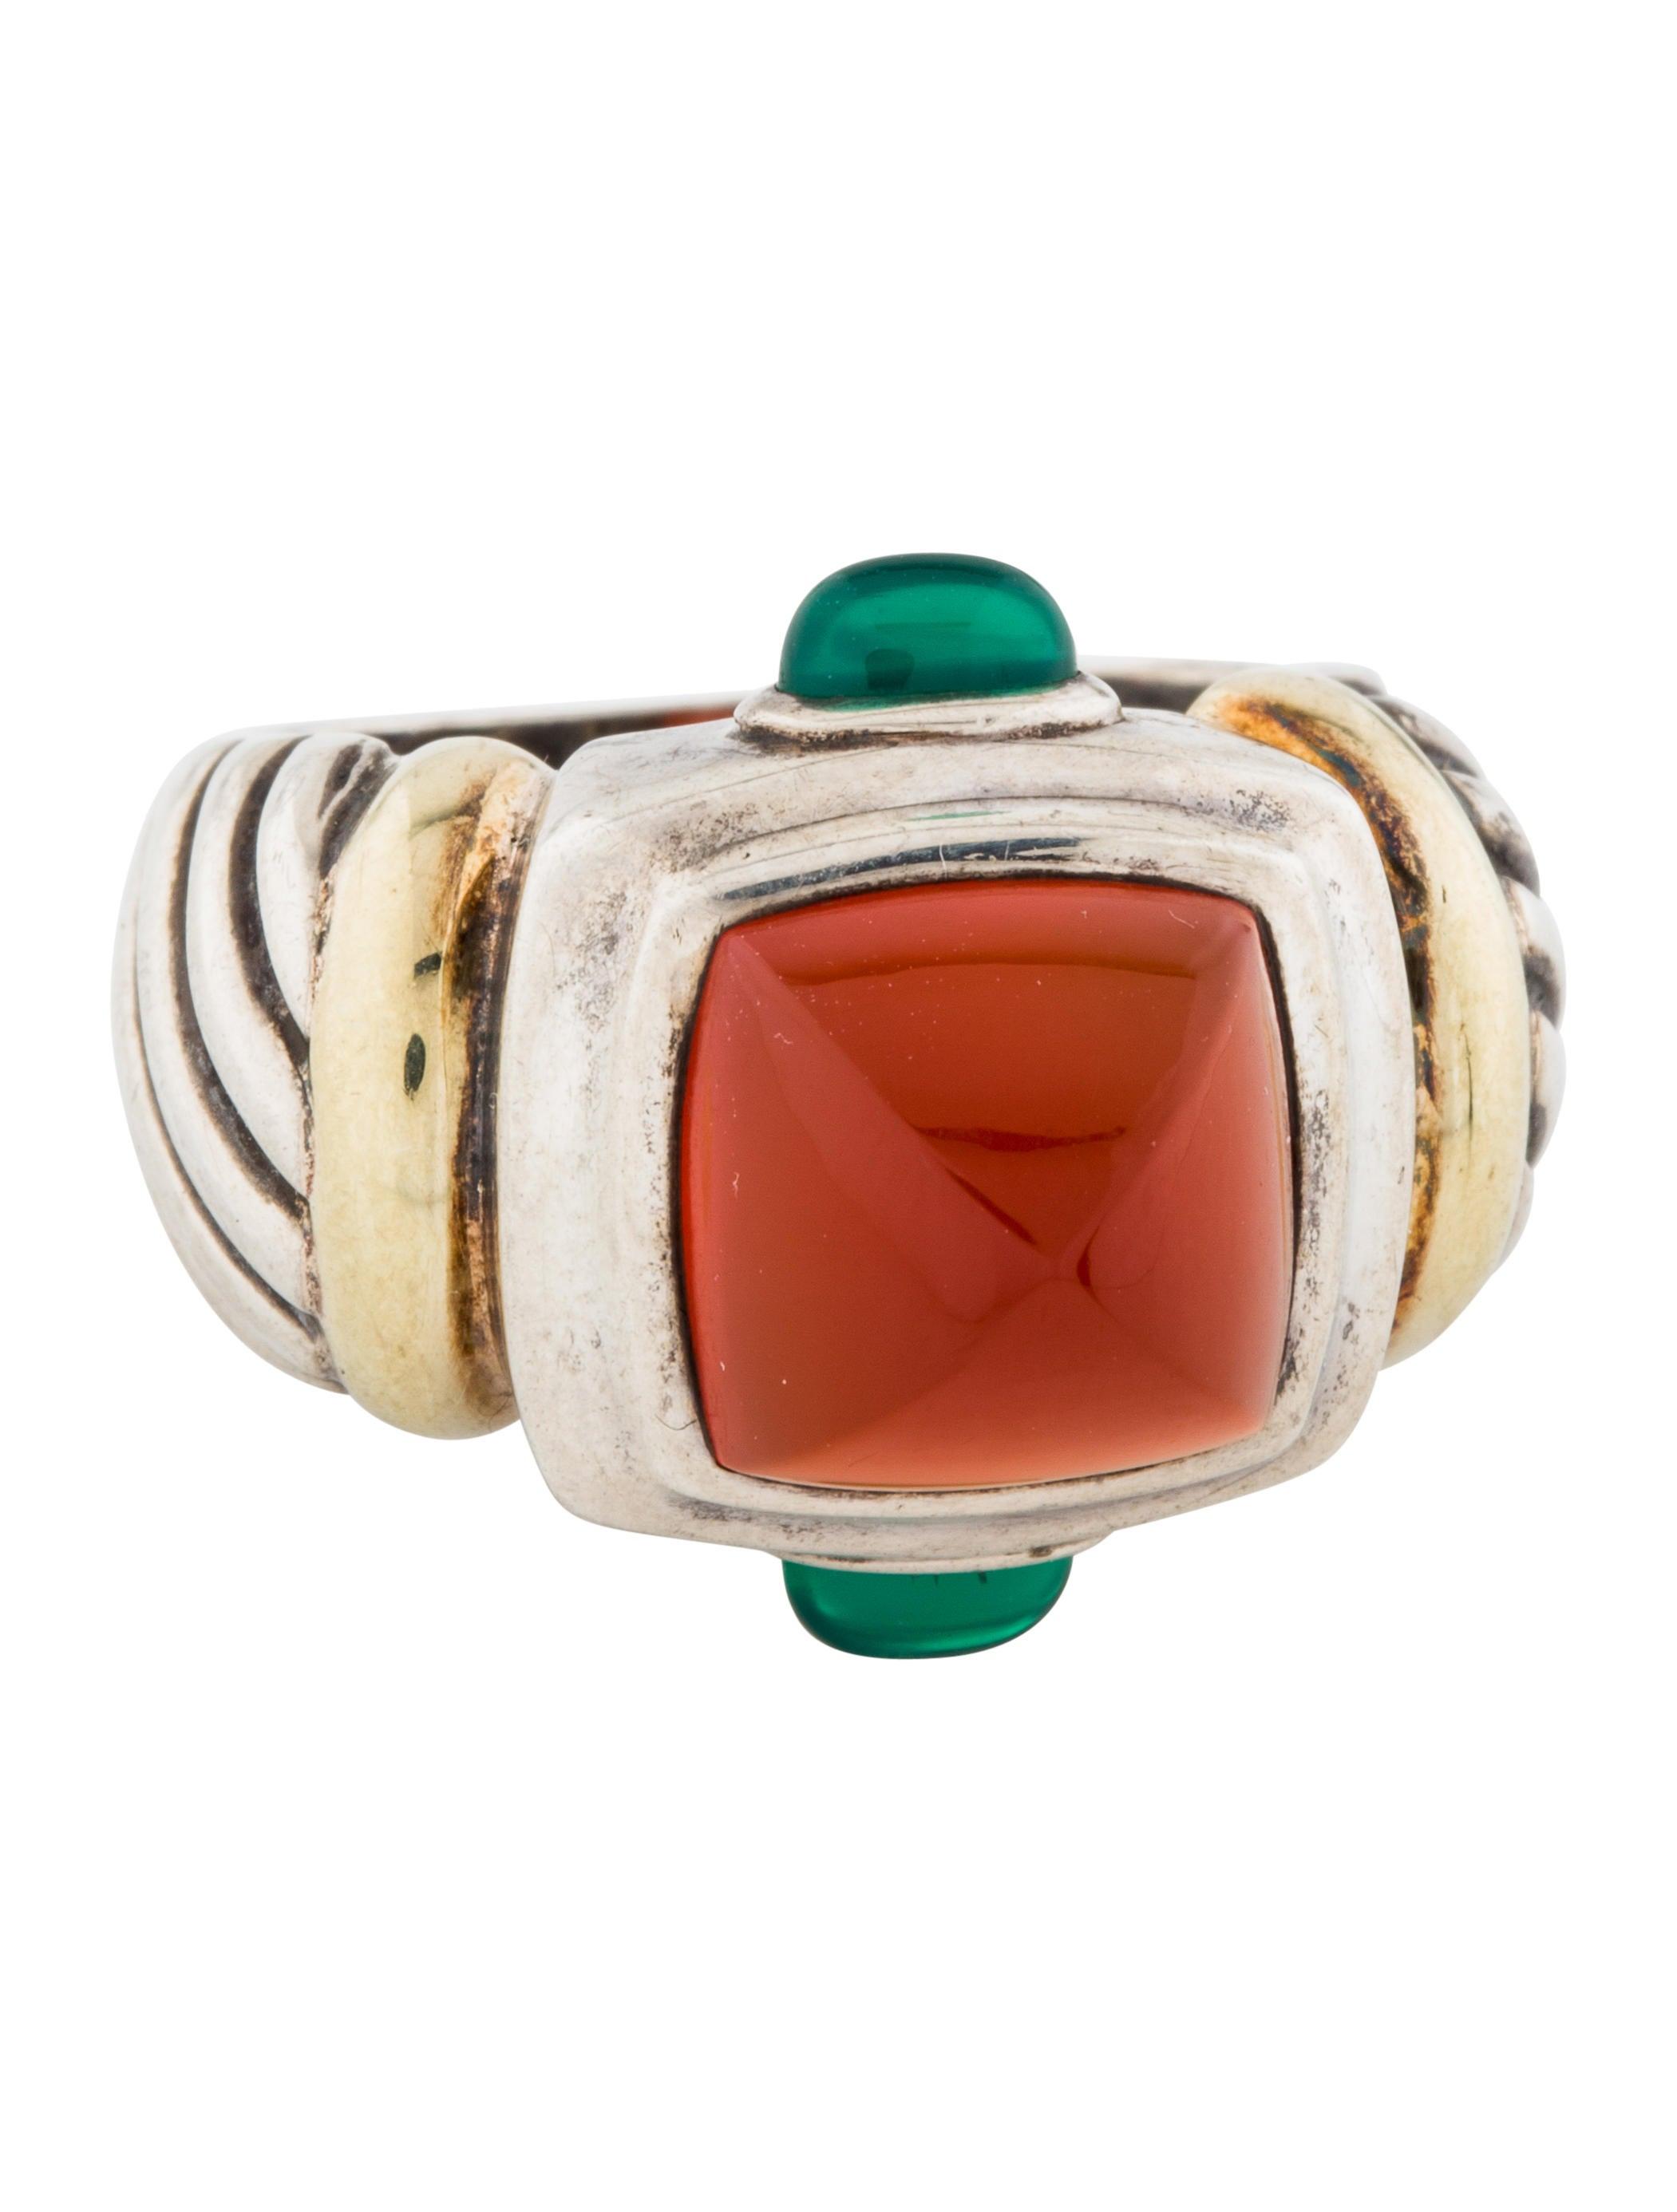 David Yurman Renaissance Carnelian Ring - Rings -           DVY56949 | The RealReal